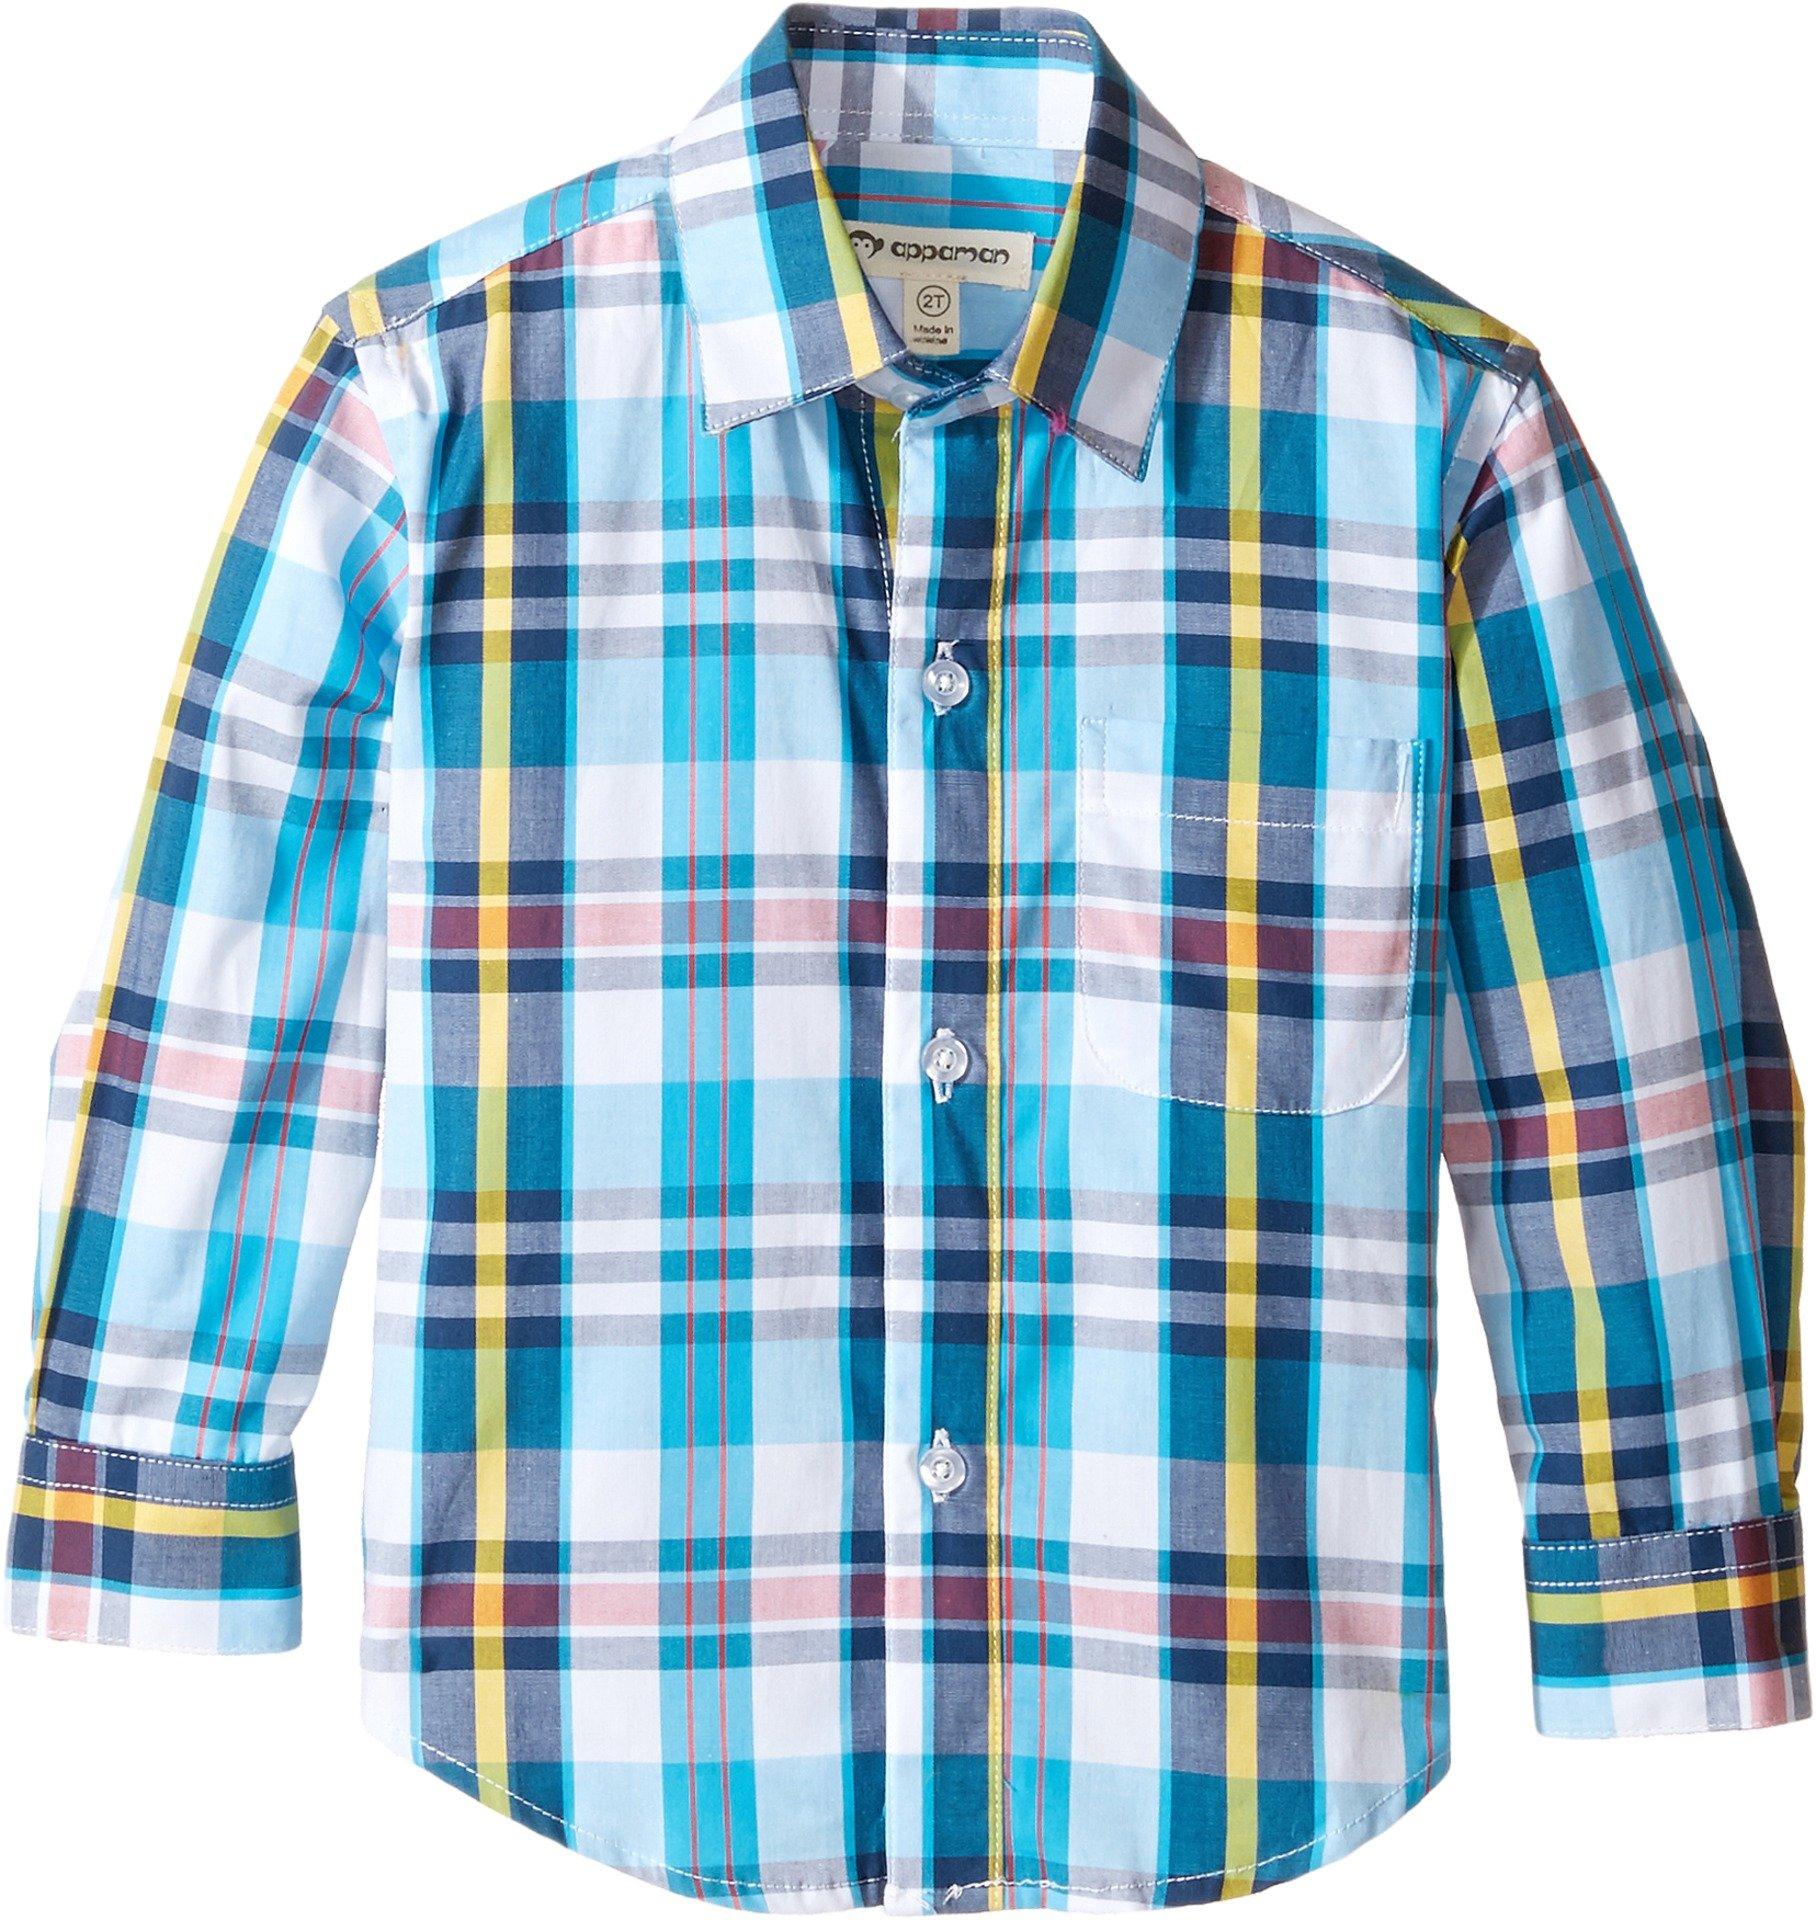 Appaman Boys' The Standard Shirt, Turquoise/Yellow Plaid, 2T